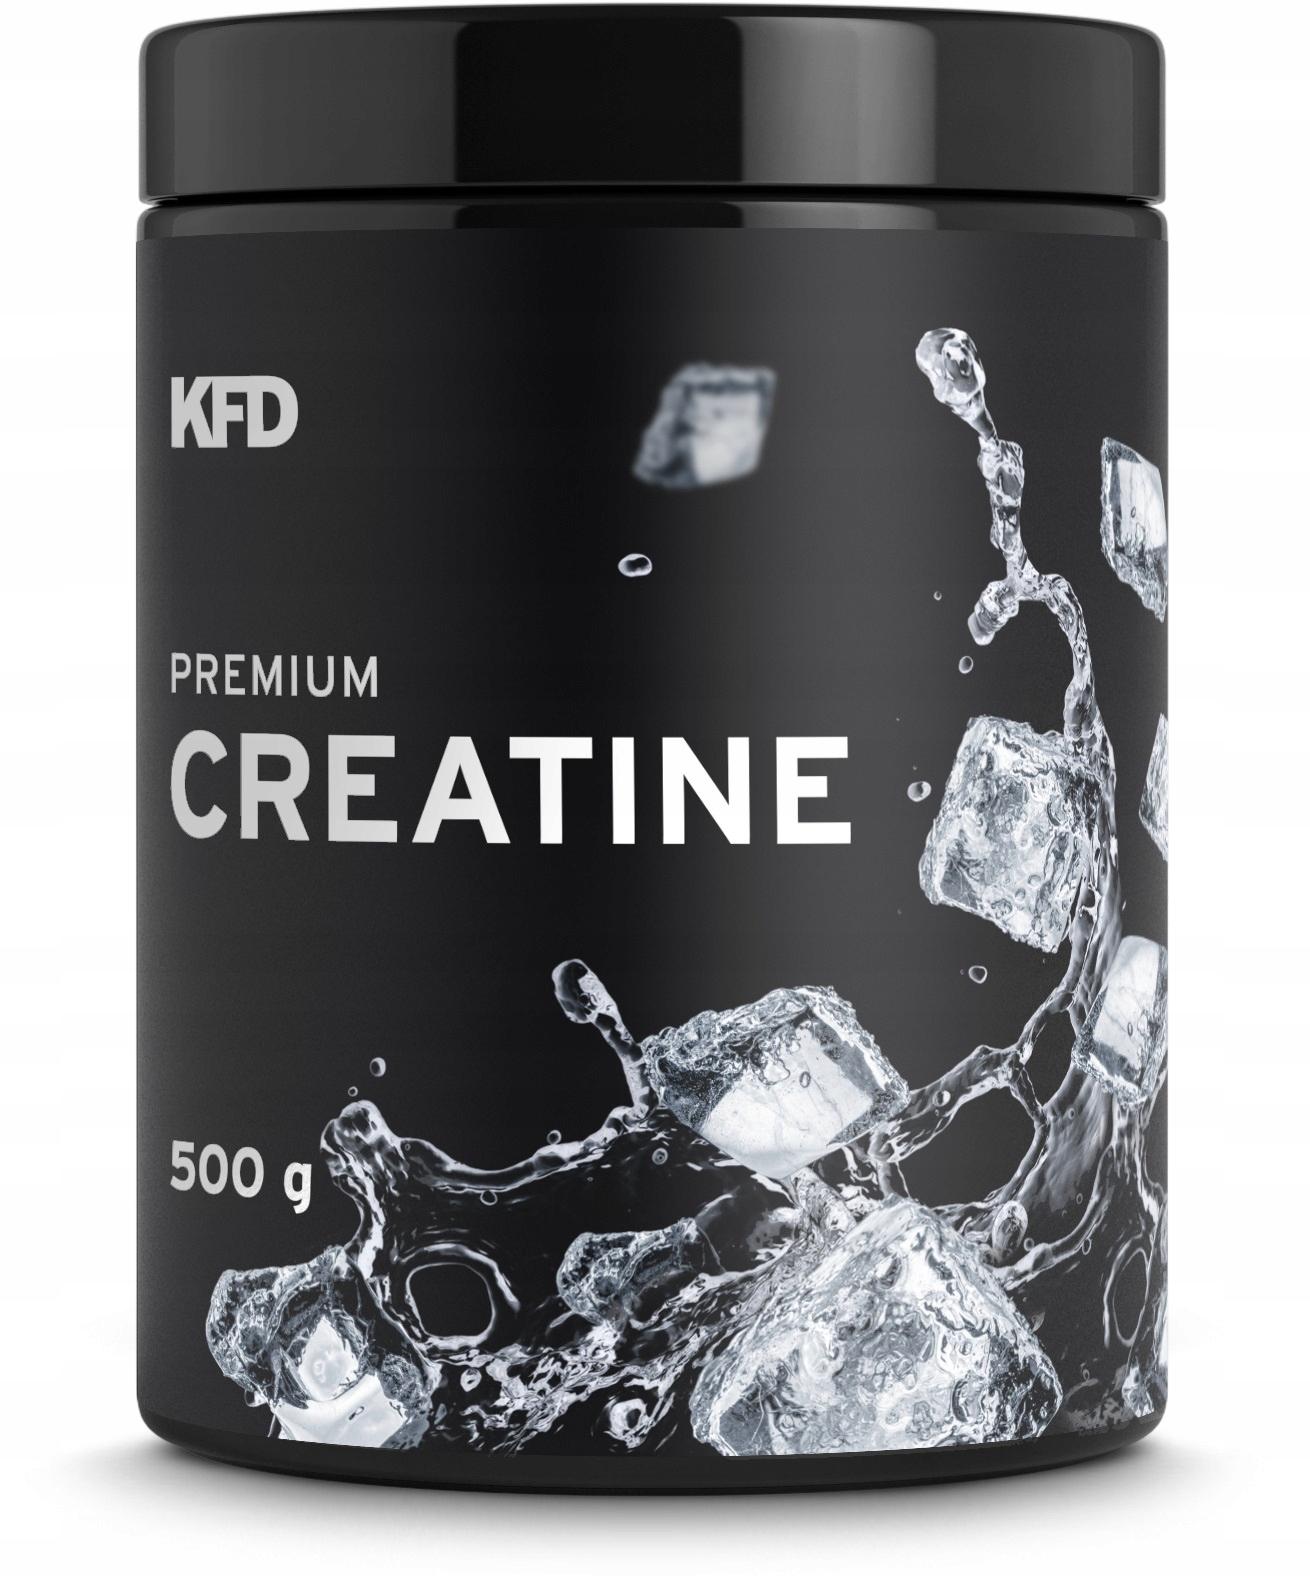 KFD PREMIUM CREATINE 500G KREATYNA MONOHYDRAT NAT